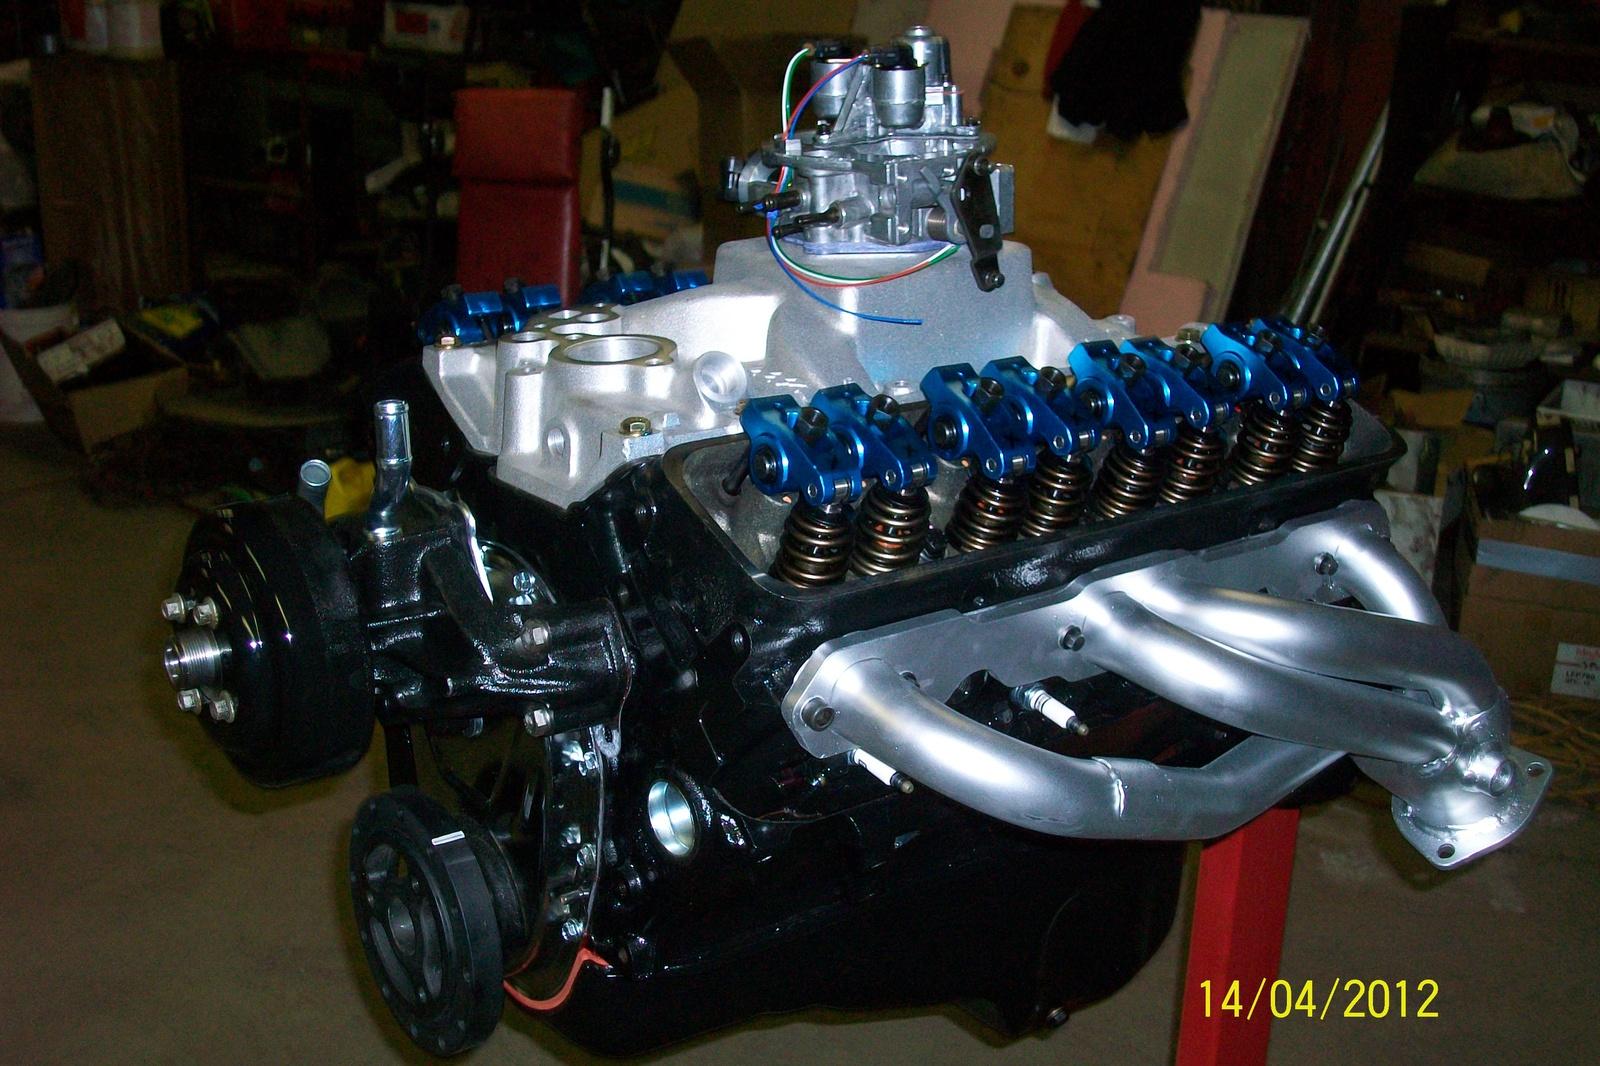 All Chevy 1997 chevrolet z71 : Chevrolet C/K 1500 Questions - 1997 Silverado at 65 rpms stay high ...